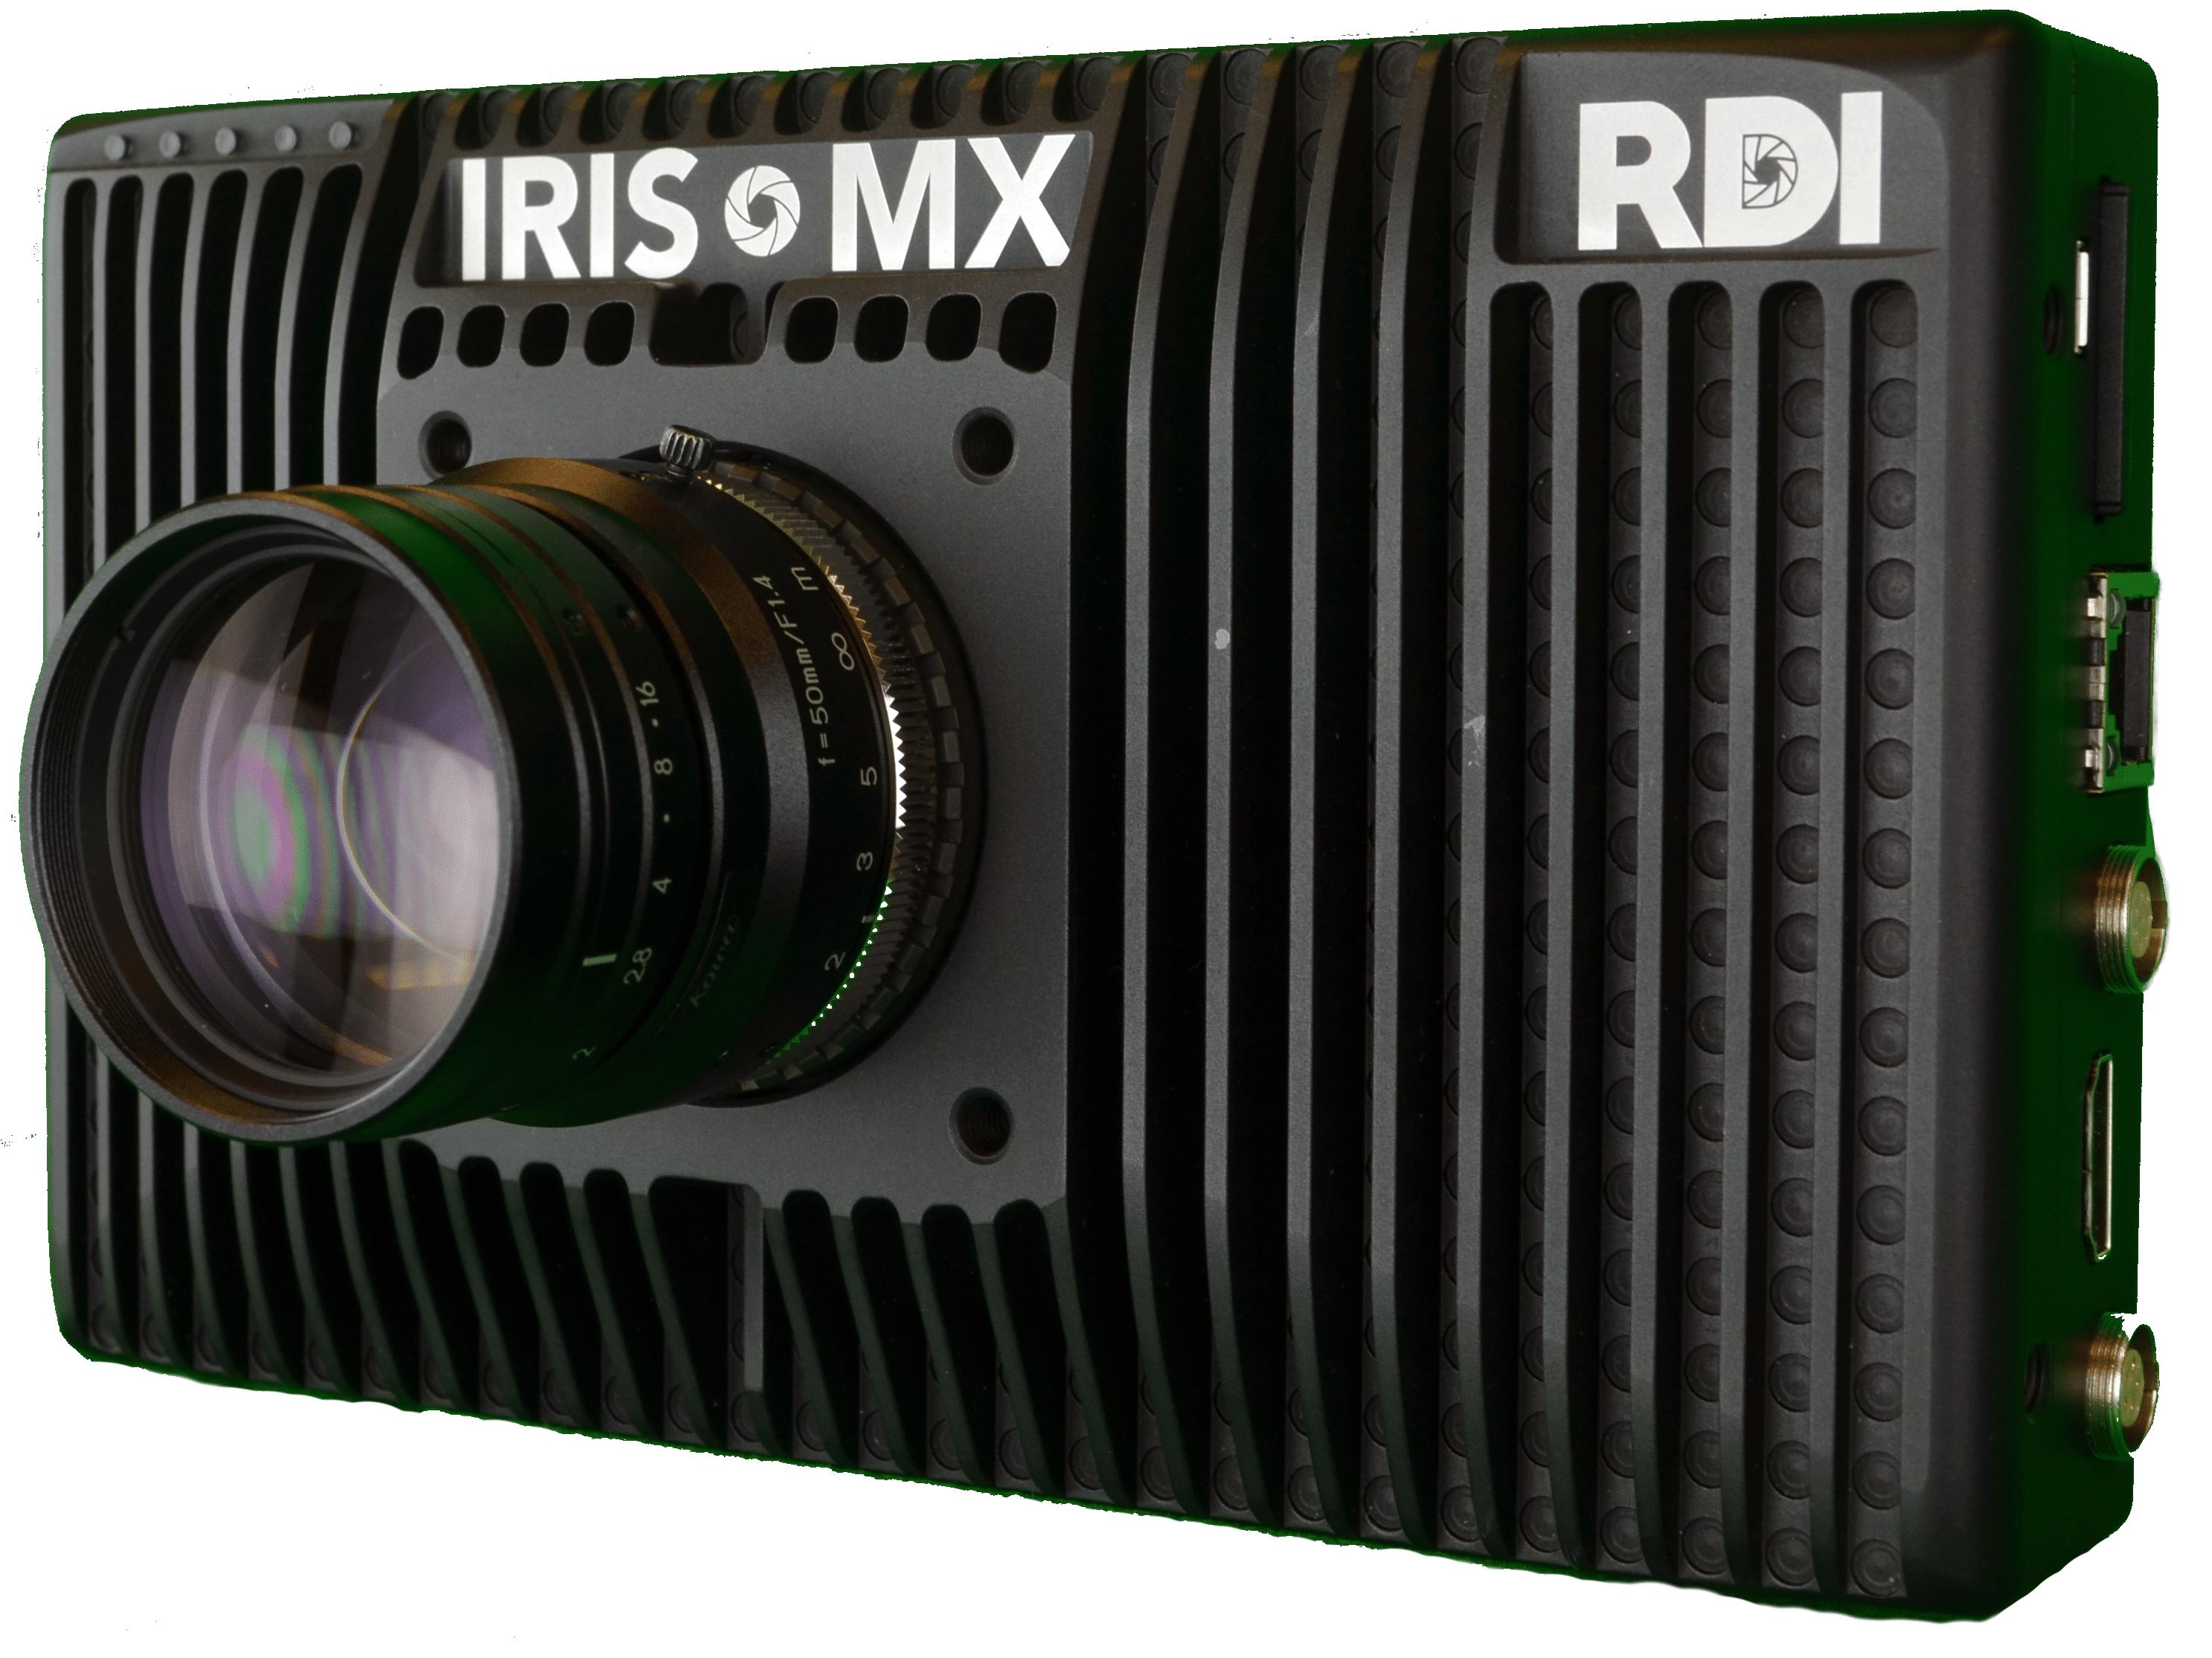 Complete Iris MX system